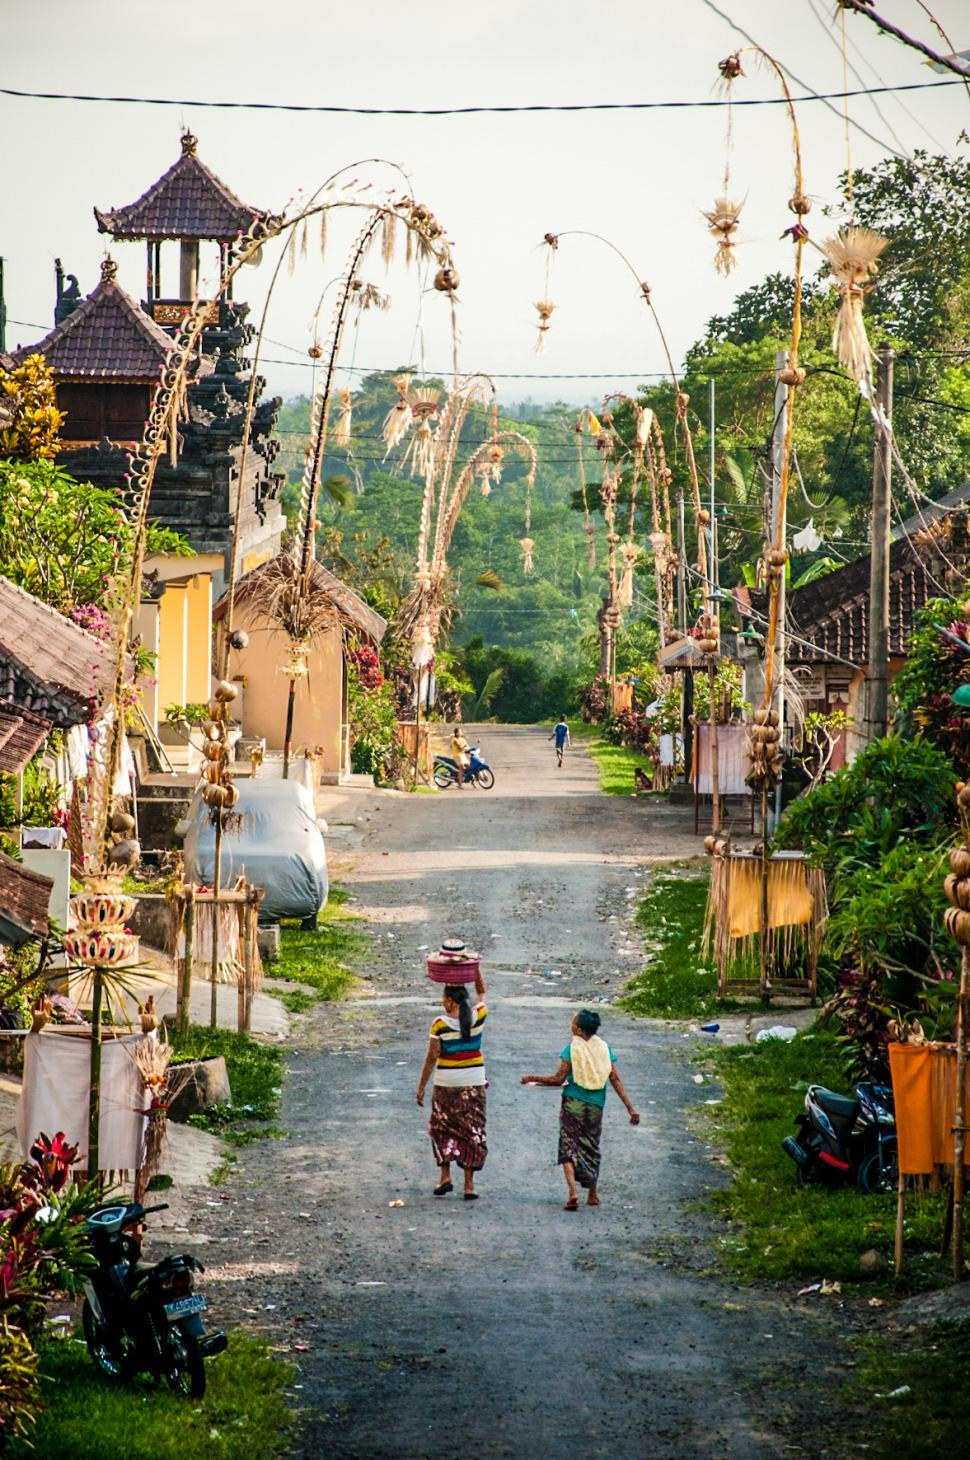 Download Free Stock HD Photo of Balinese village street Online